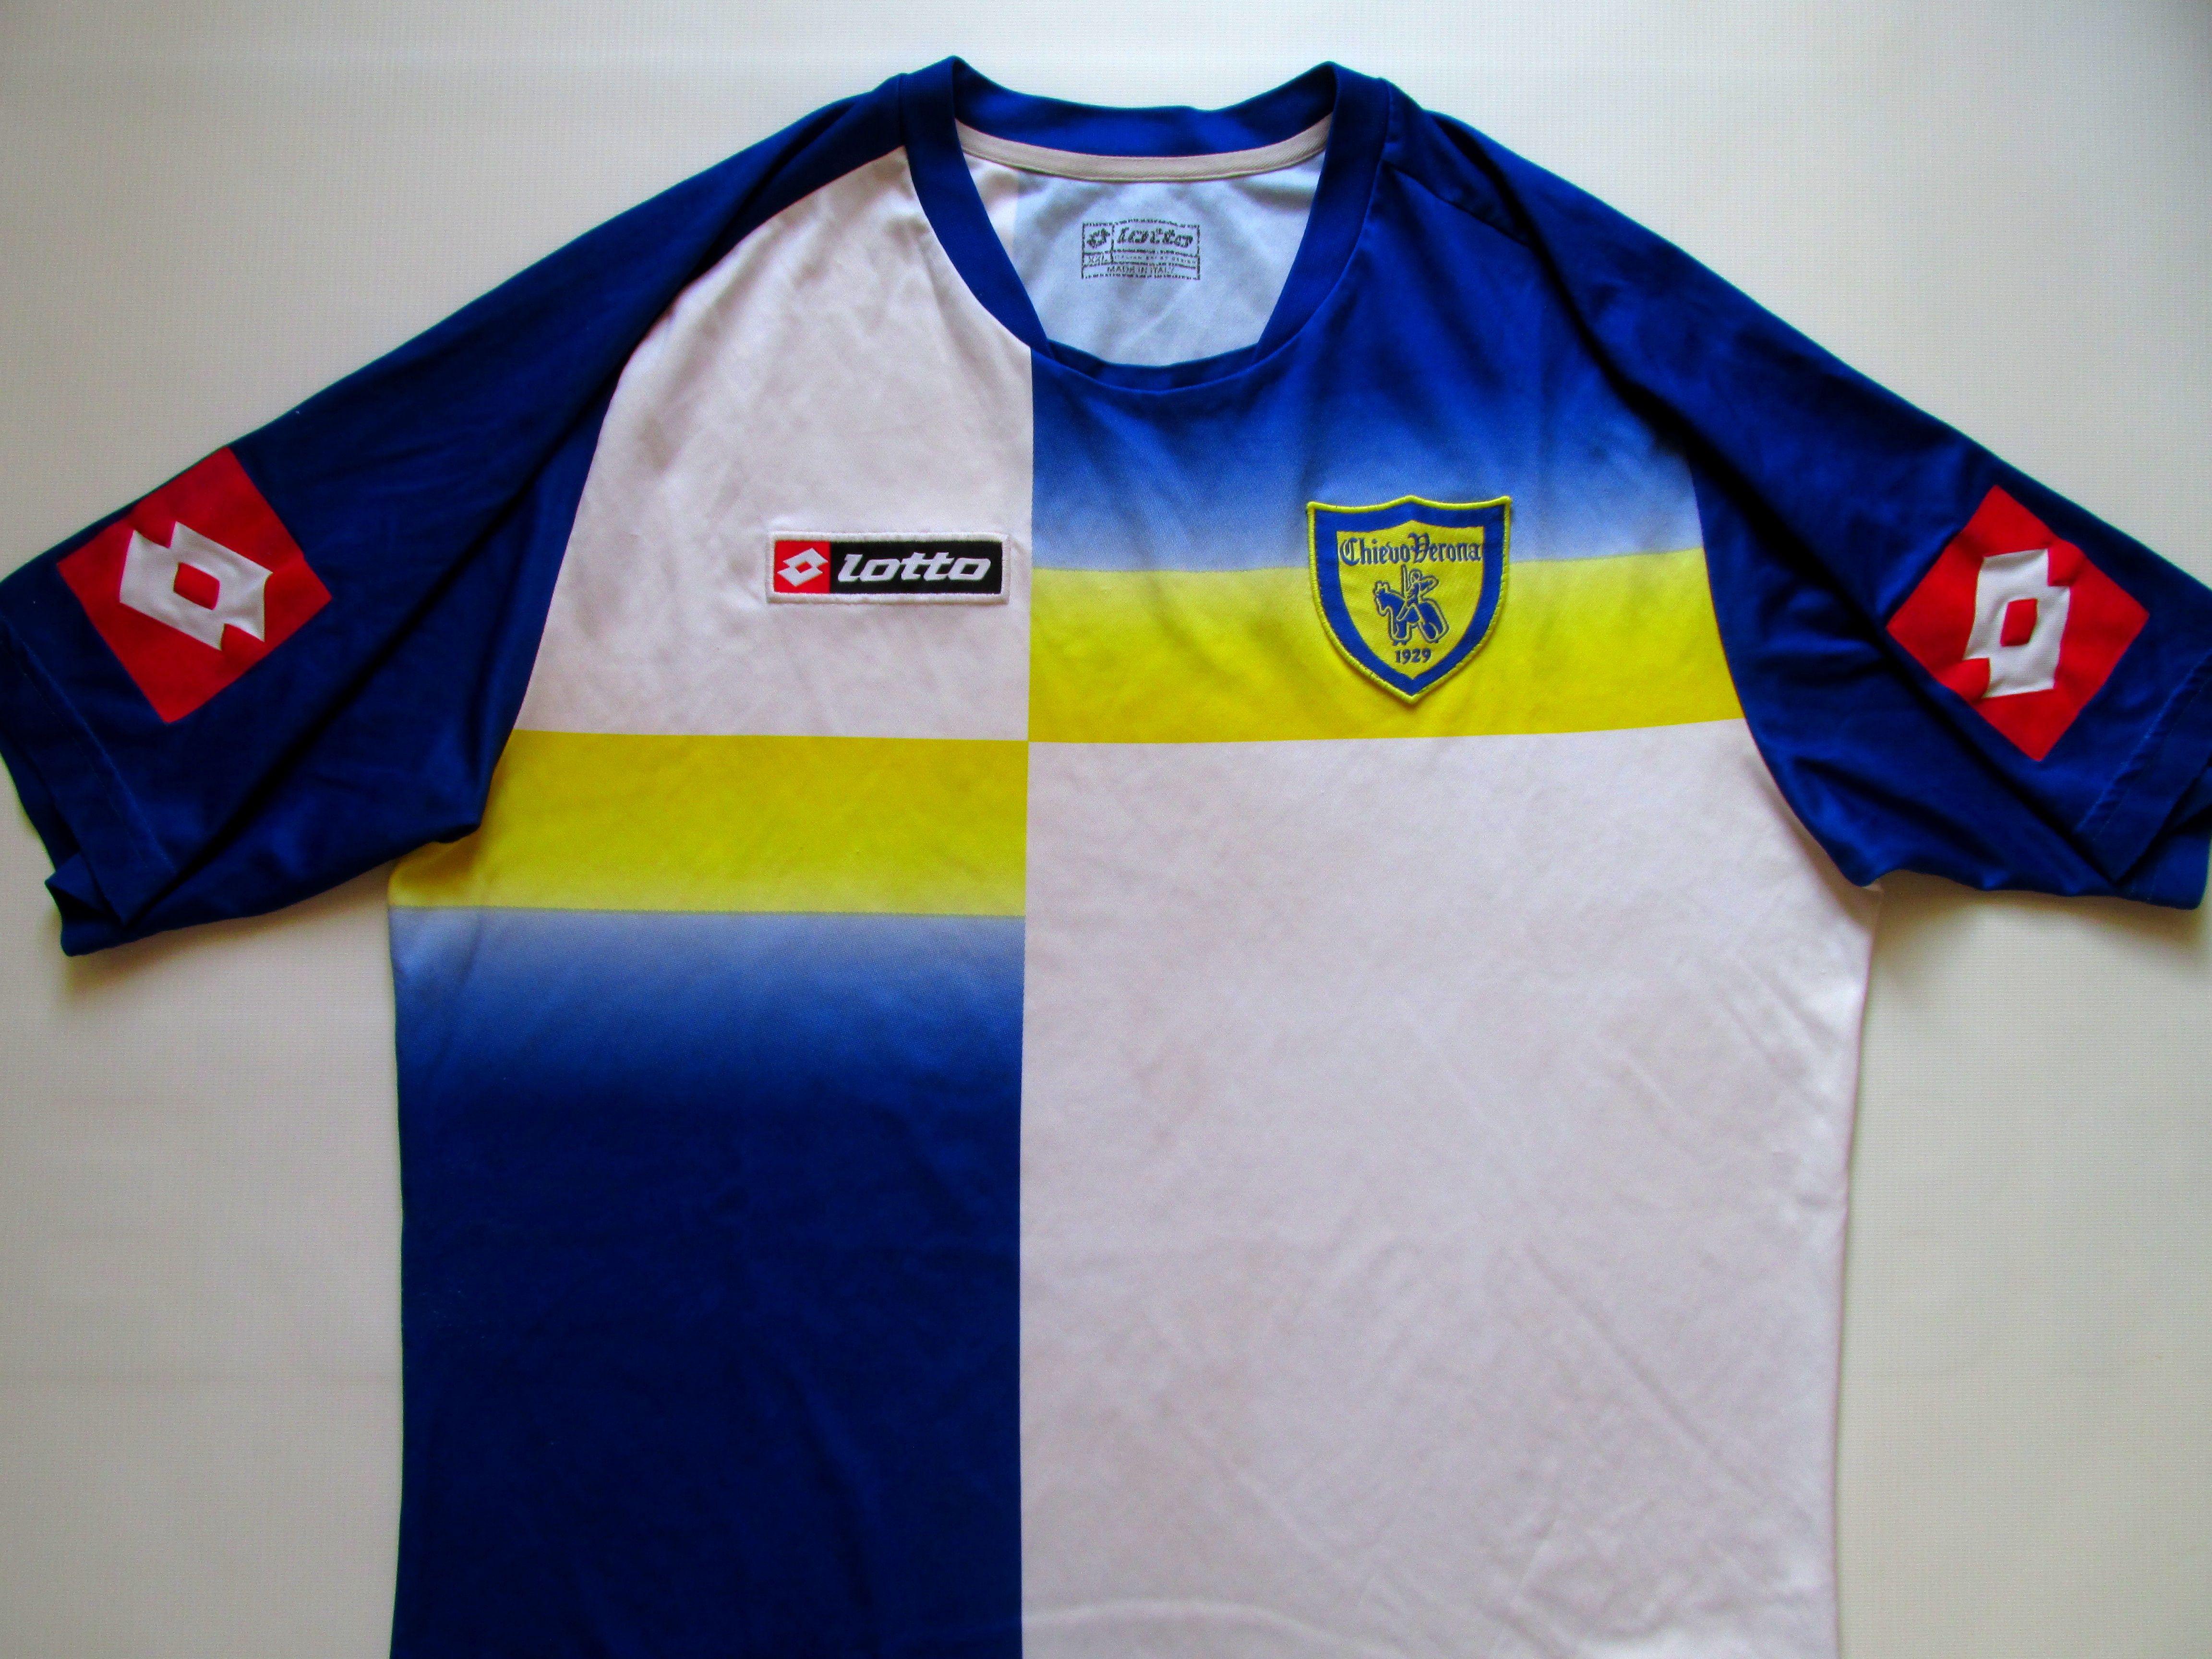 bilancio Vento educare  AC CHIEVO VERONA 2006/2007 AWAY FOOTBALL SHIRT MAGLIA SOCCER JERSEY LOTTO  CALCIO | eBay in 2020 | Football shirts, Soccer jersey, Vintage football  shirts